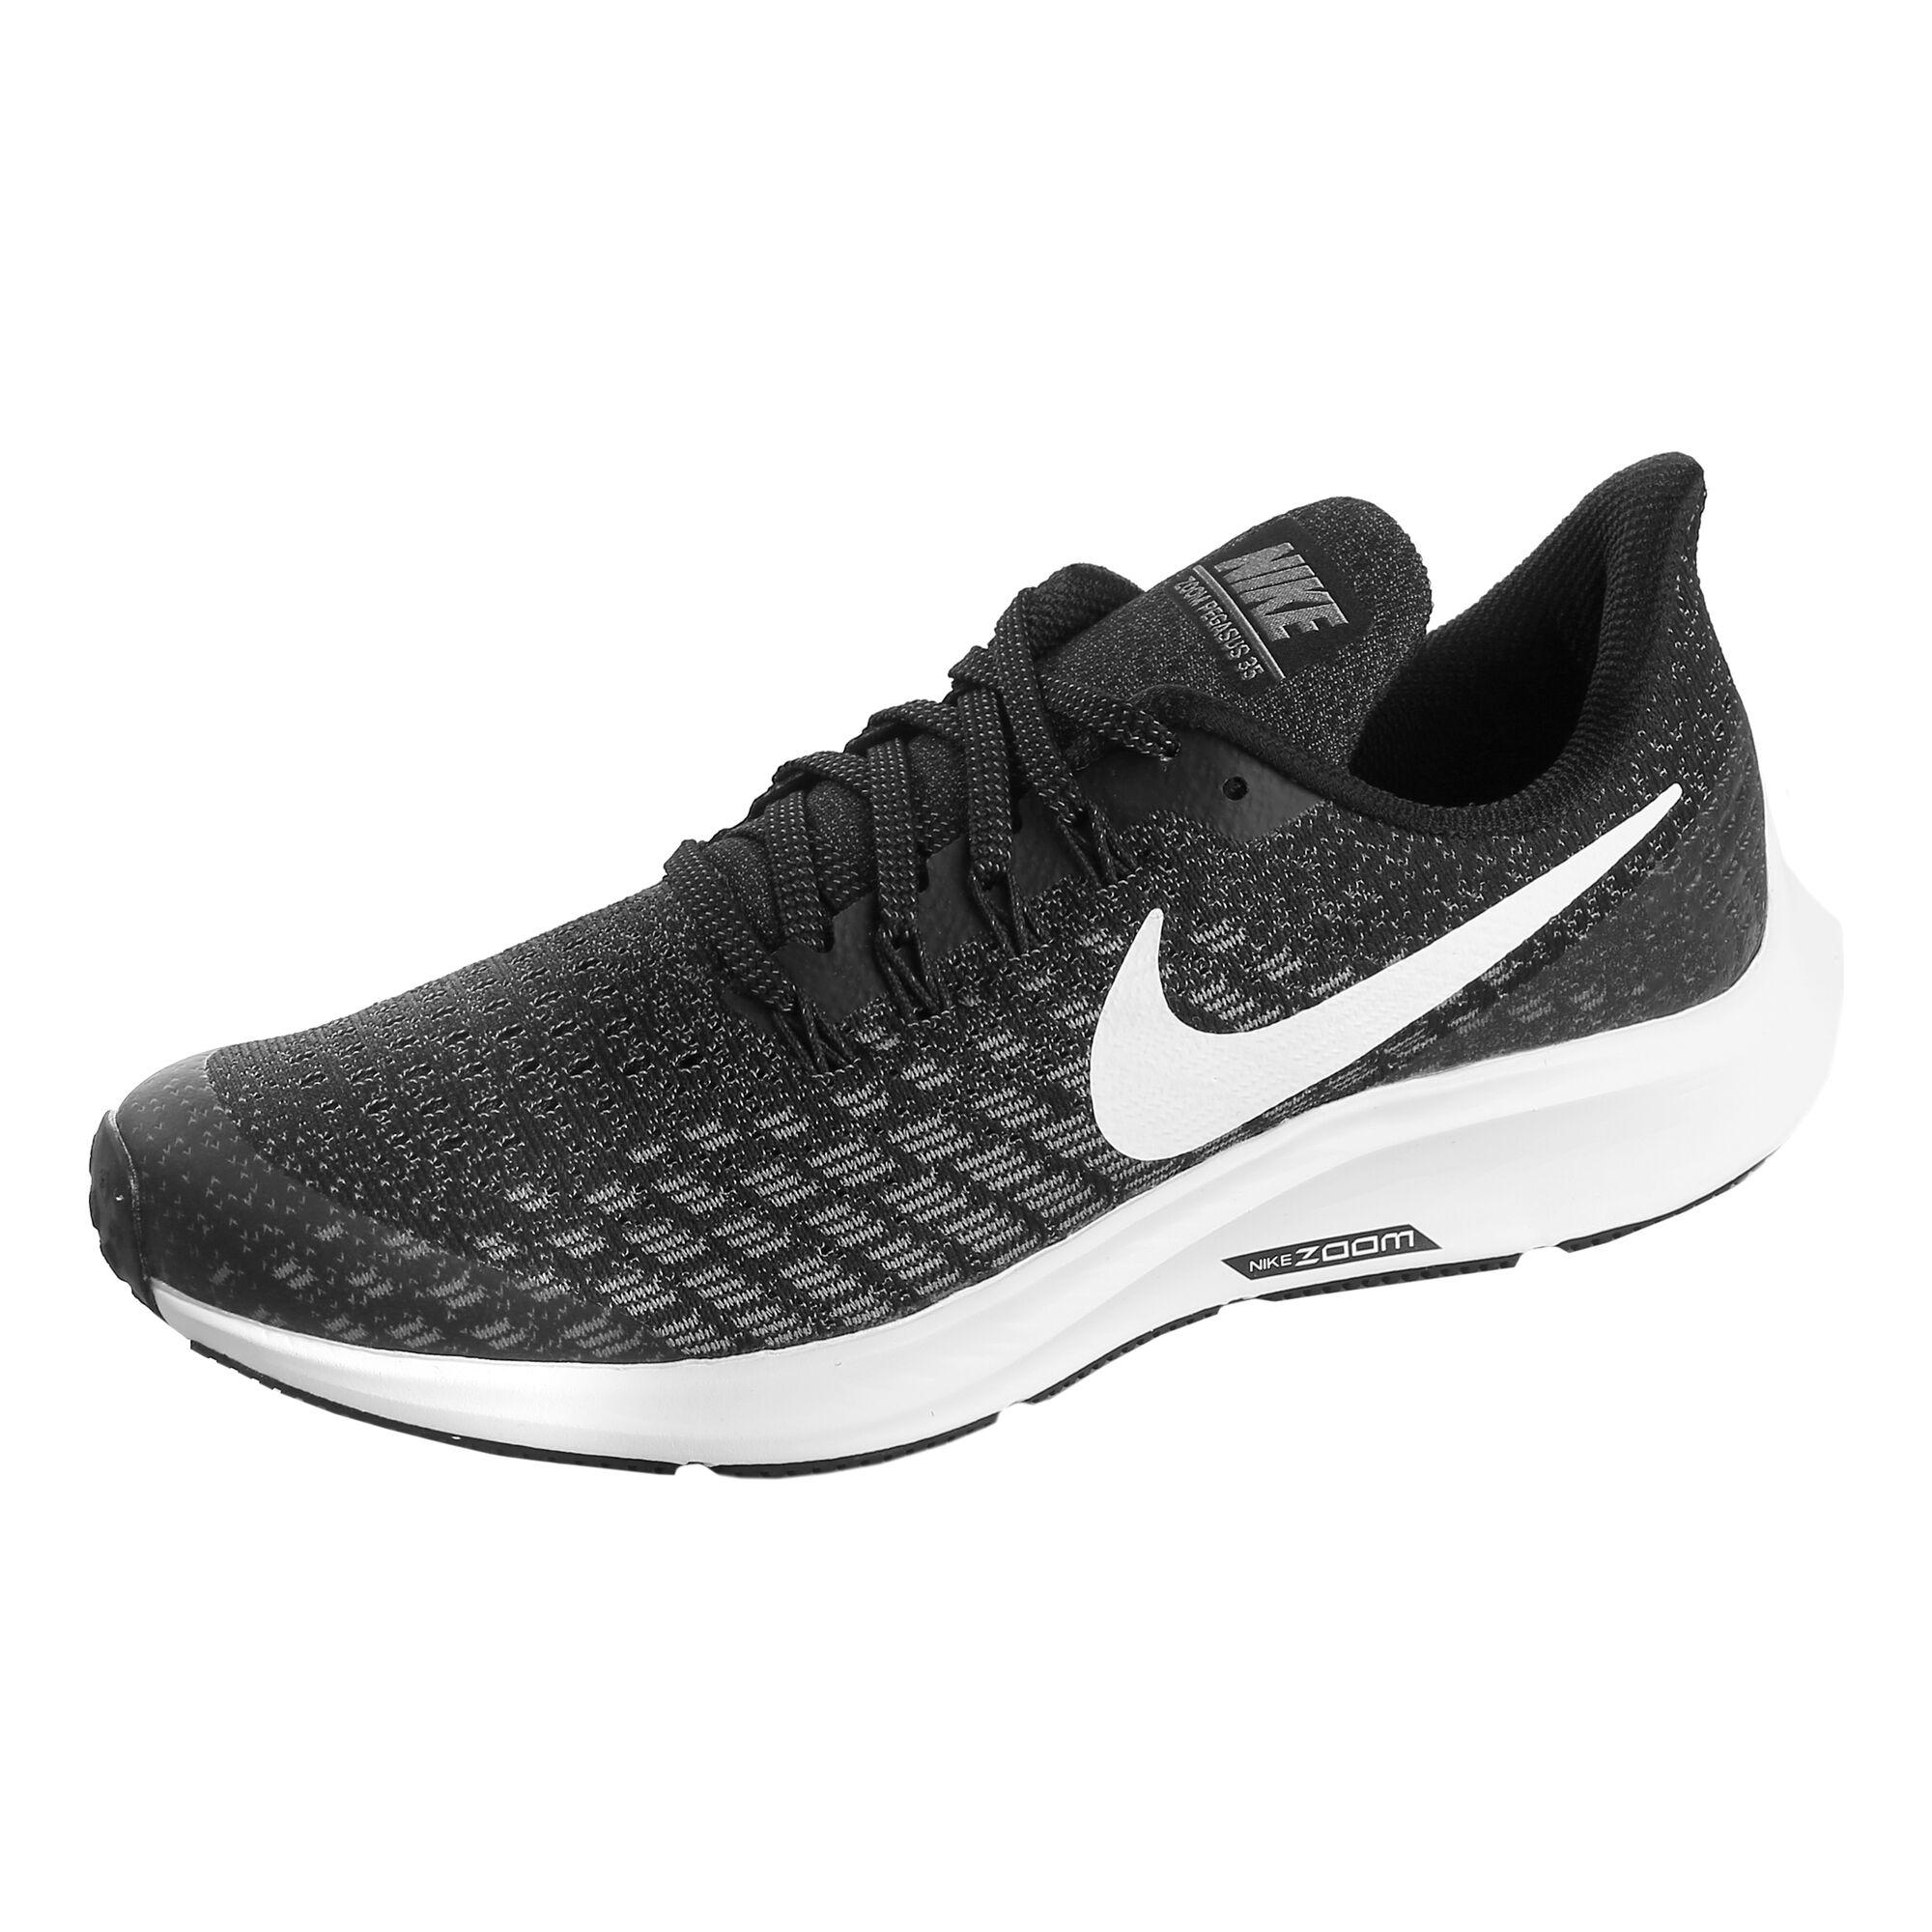 e321230dbf531 Nike · Nike · Nike · Nike · Nike · Nike · Nike · Nike · Nike · Nike · Nike. Air  Zoom Pegasus 35 GS Kids ...